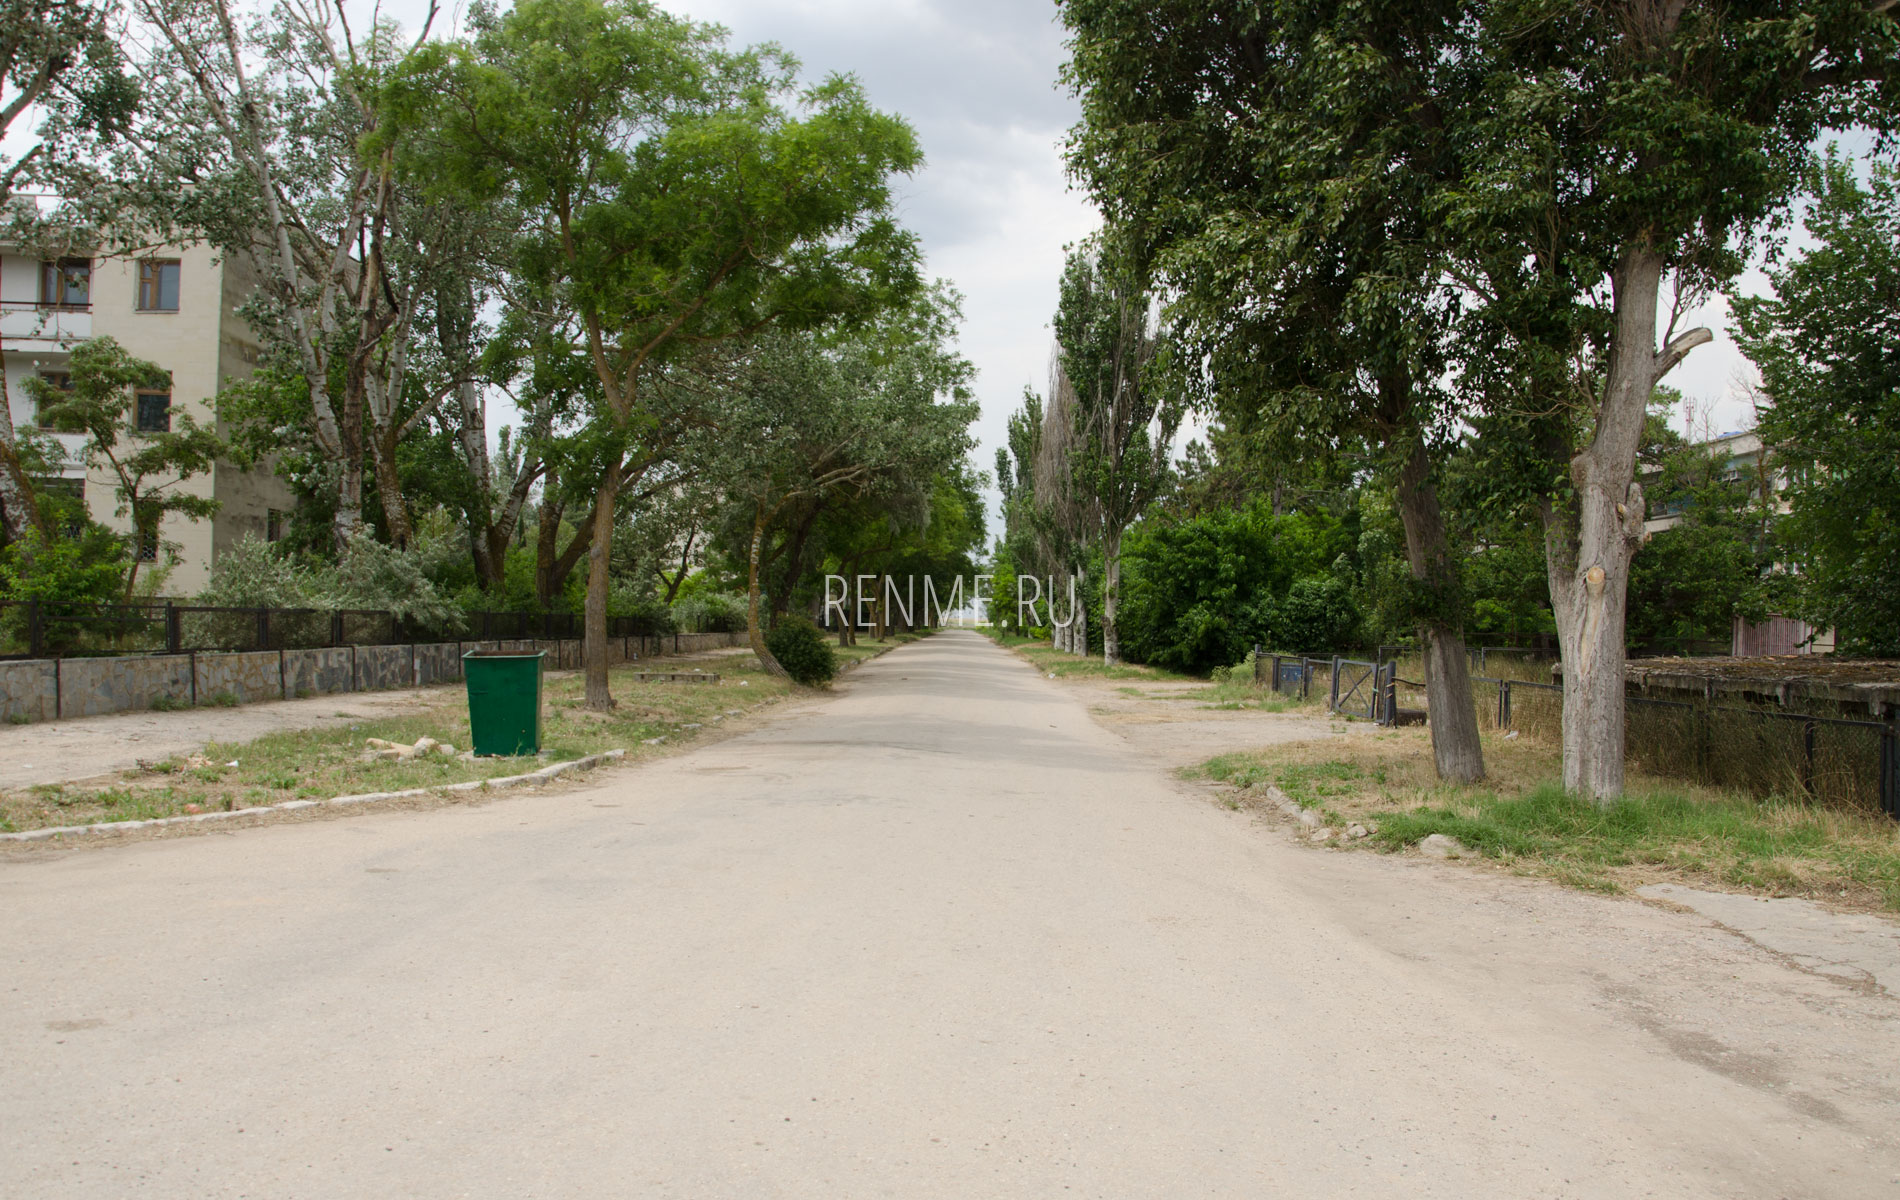 Дорога к пляжу Керкинитида. Фото Заозёрного